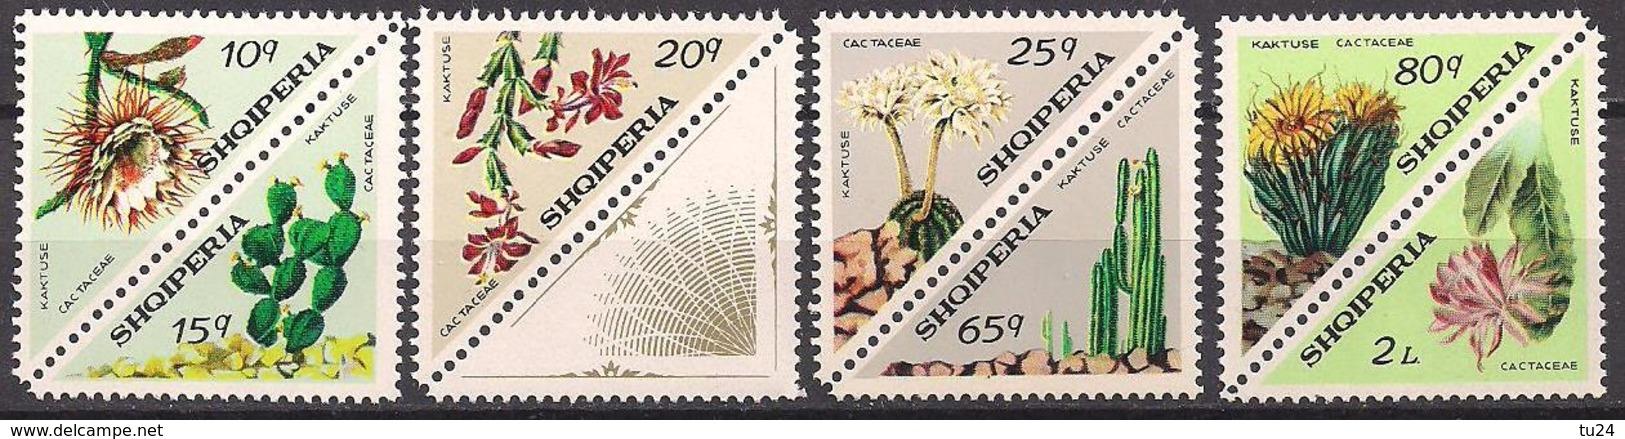 Albanien  (1973)  Mi.Nr.  1612 - 1615 + 1617 - 1619  ** / Mnh  (6ad48) - Albania